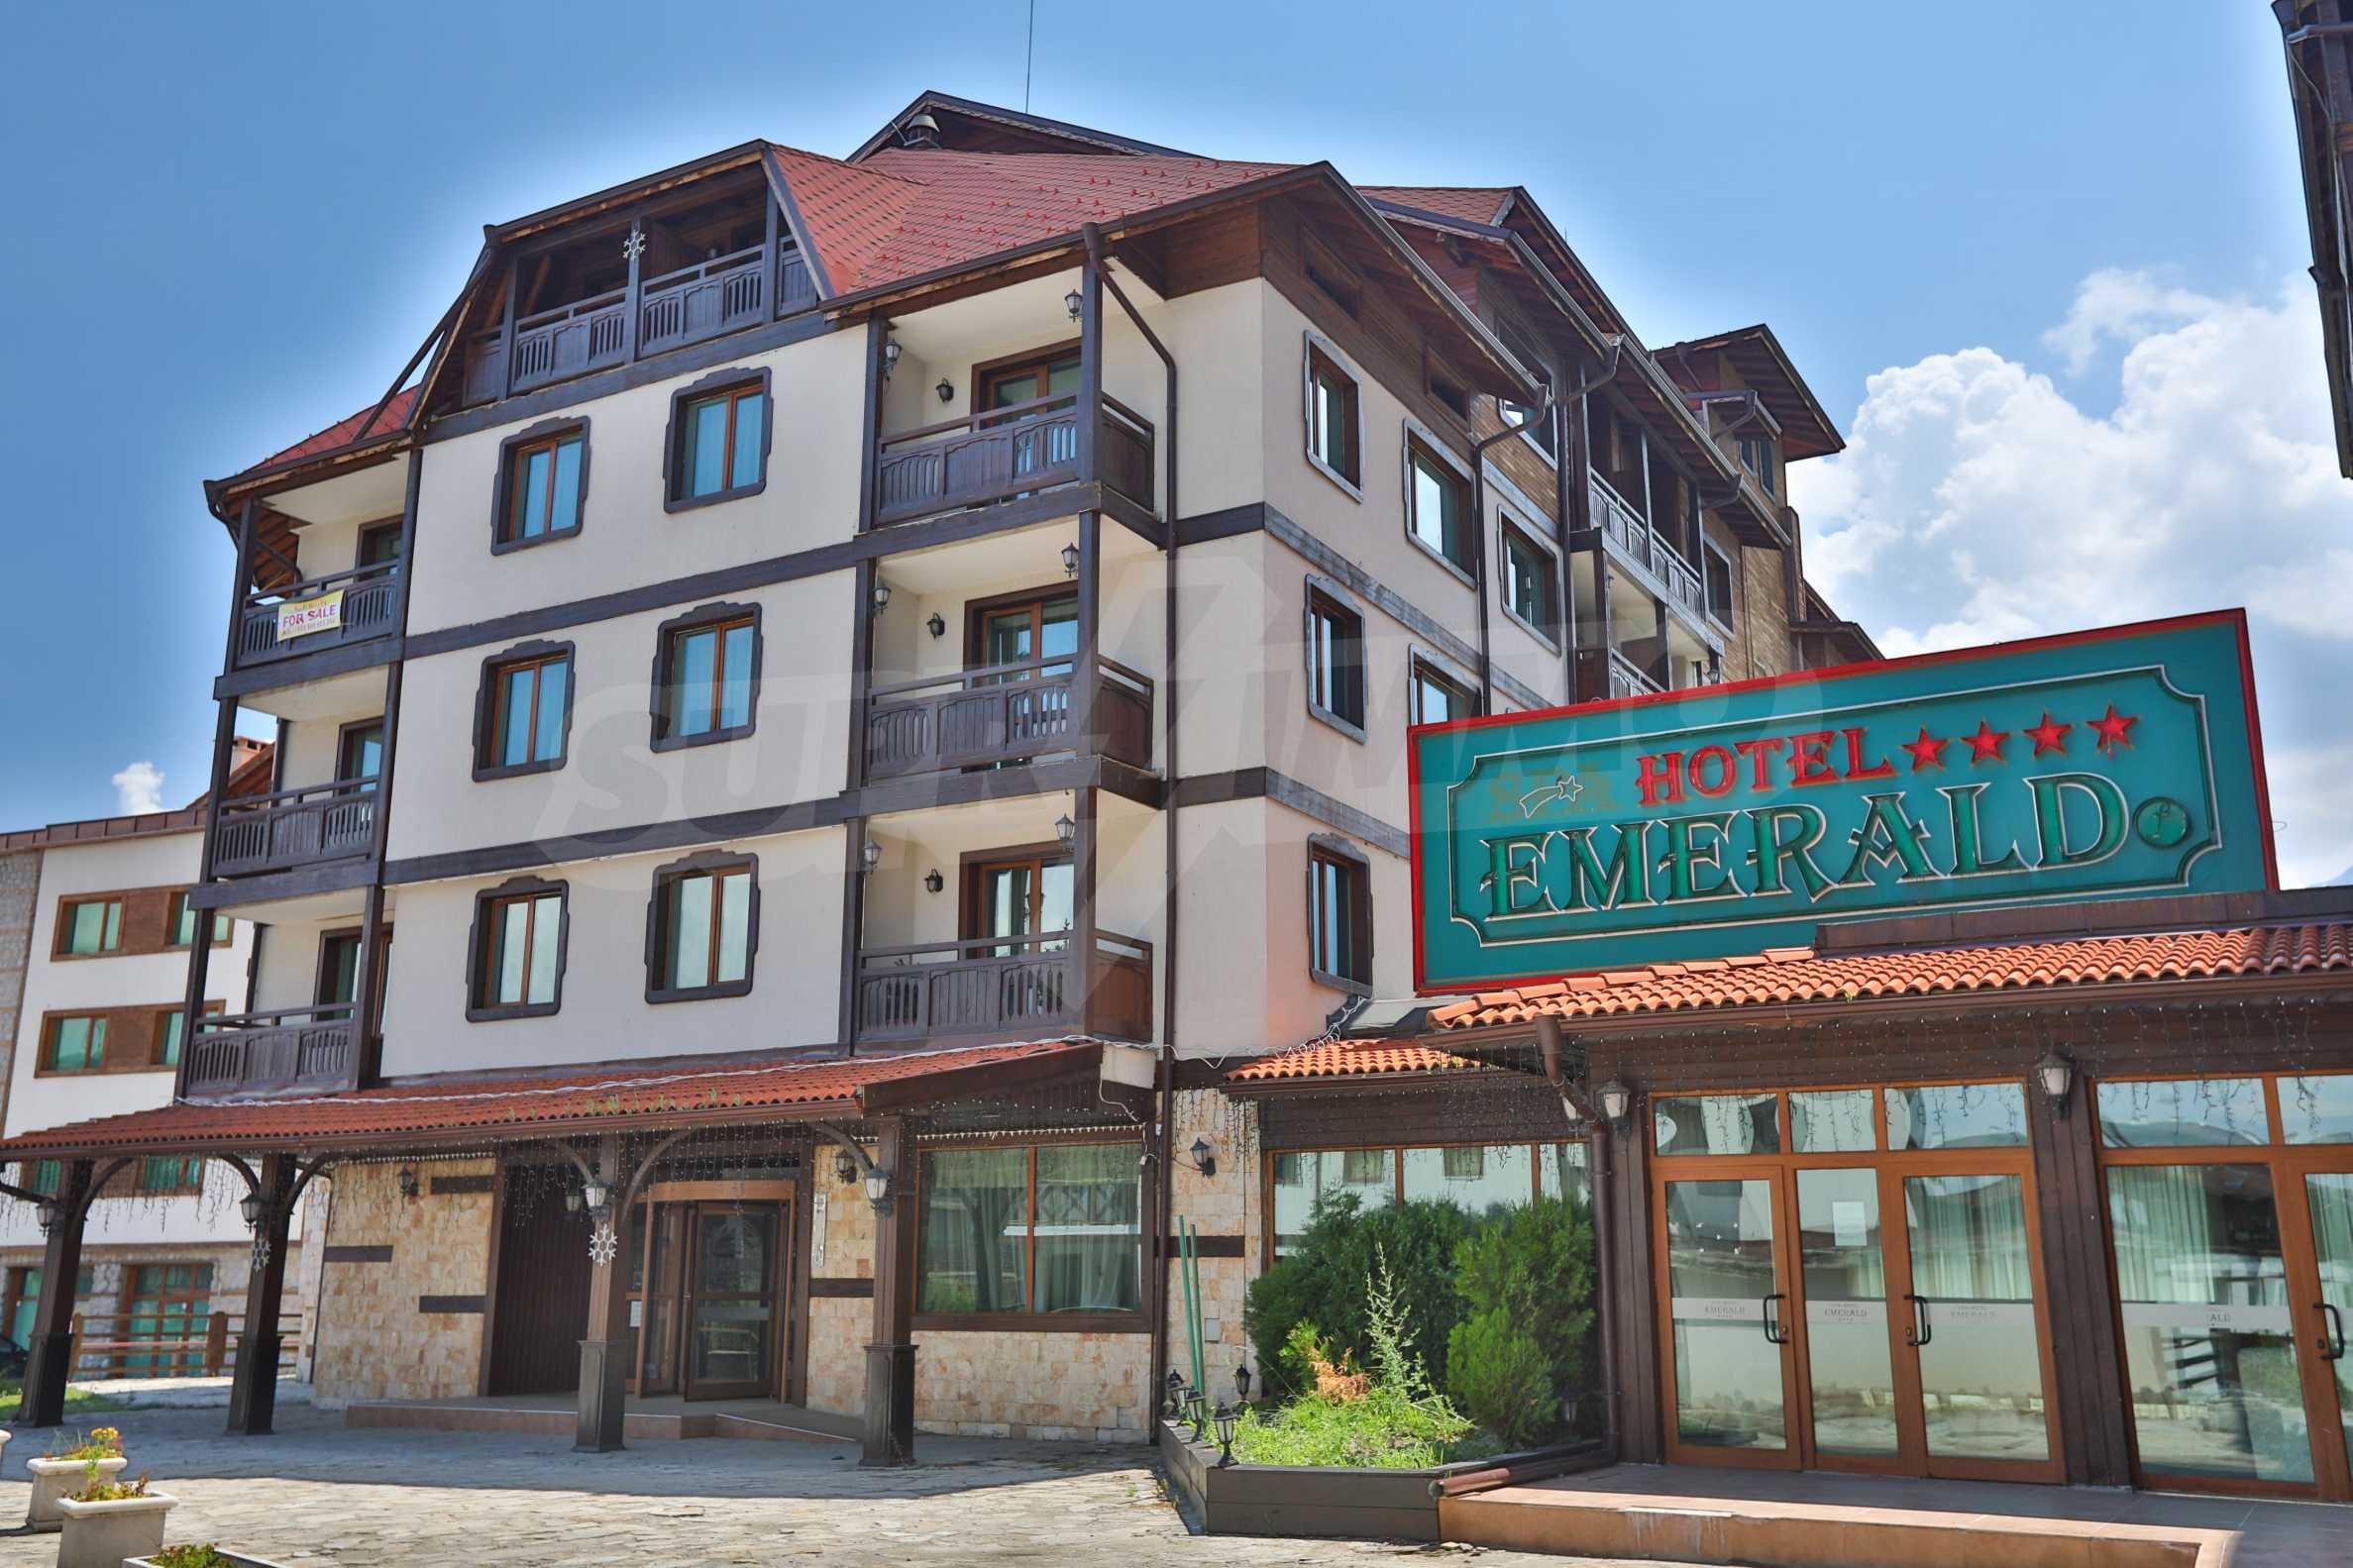 Просторен тристаен апартамент, намиращ се в комплекс Емералд в Банско 1